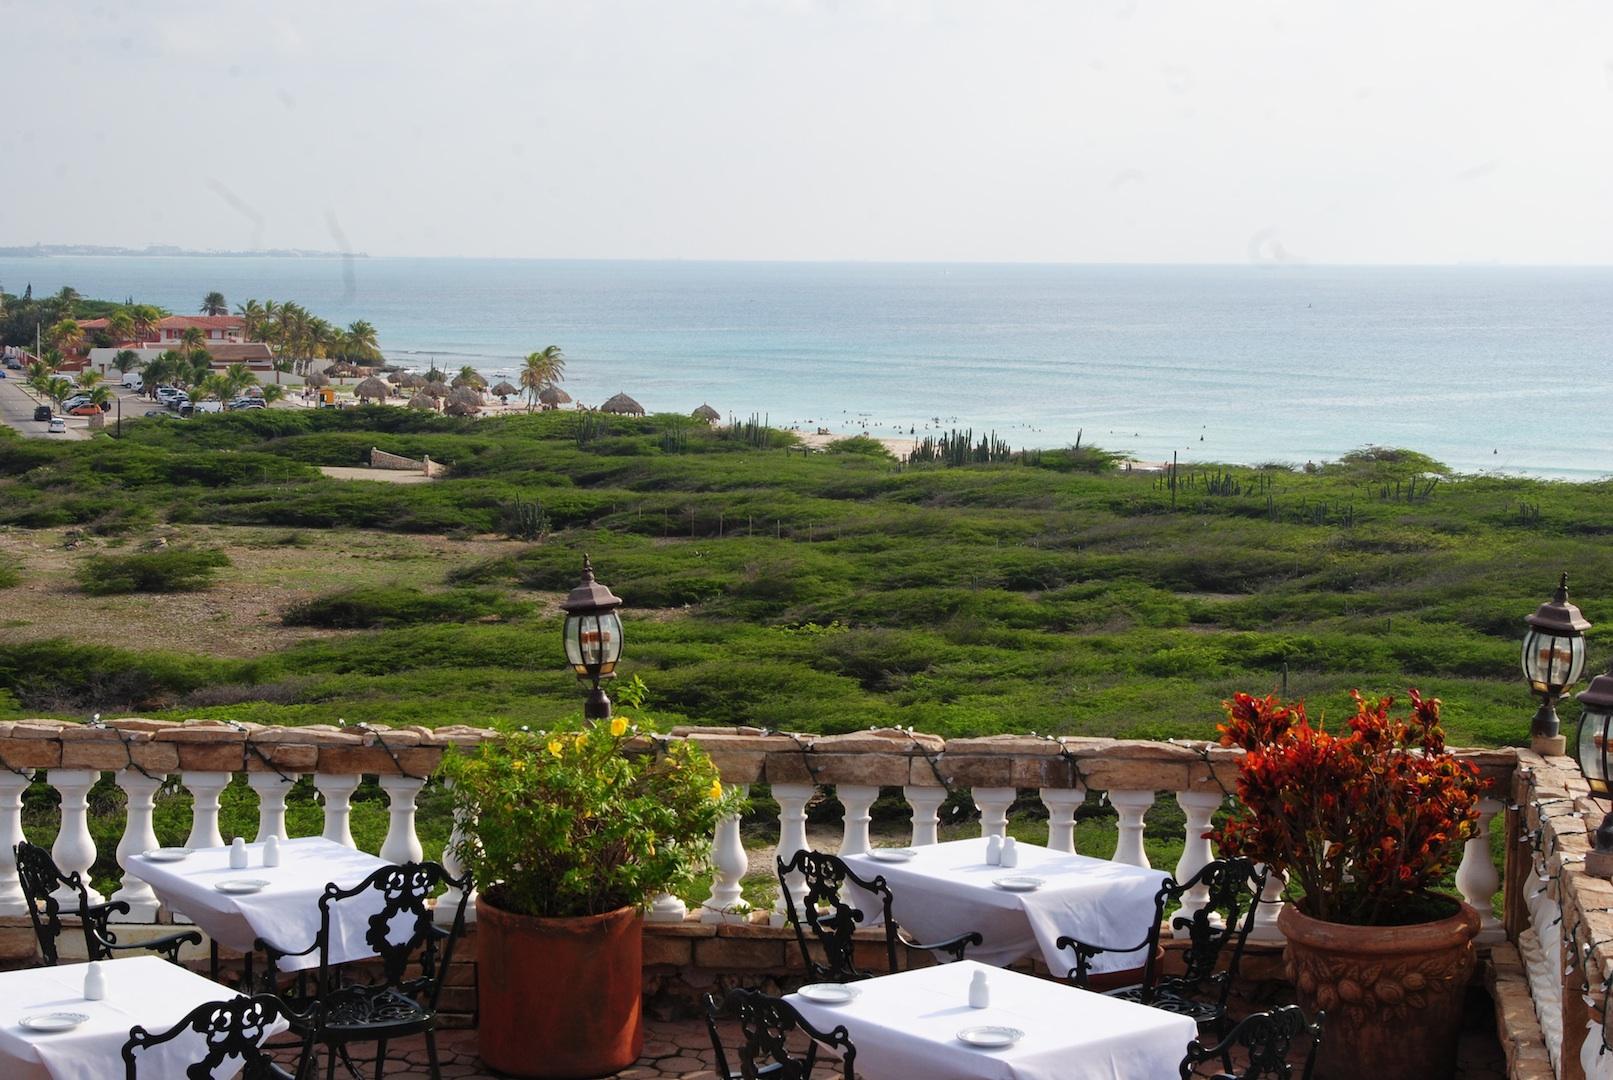 Famous Italian Restaurant In Aruba